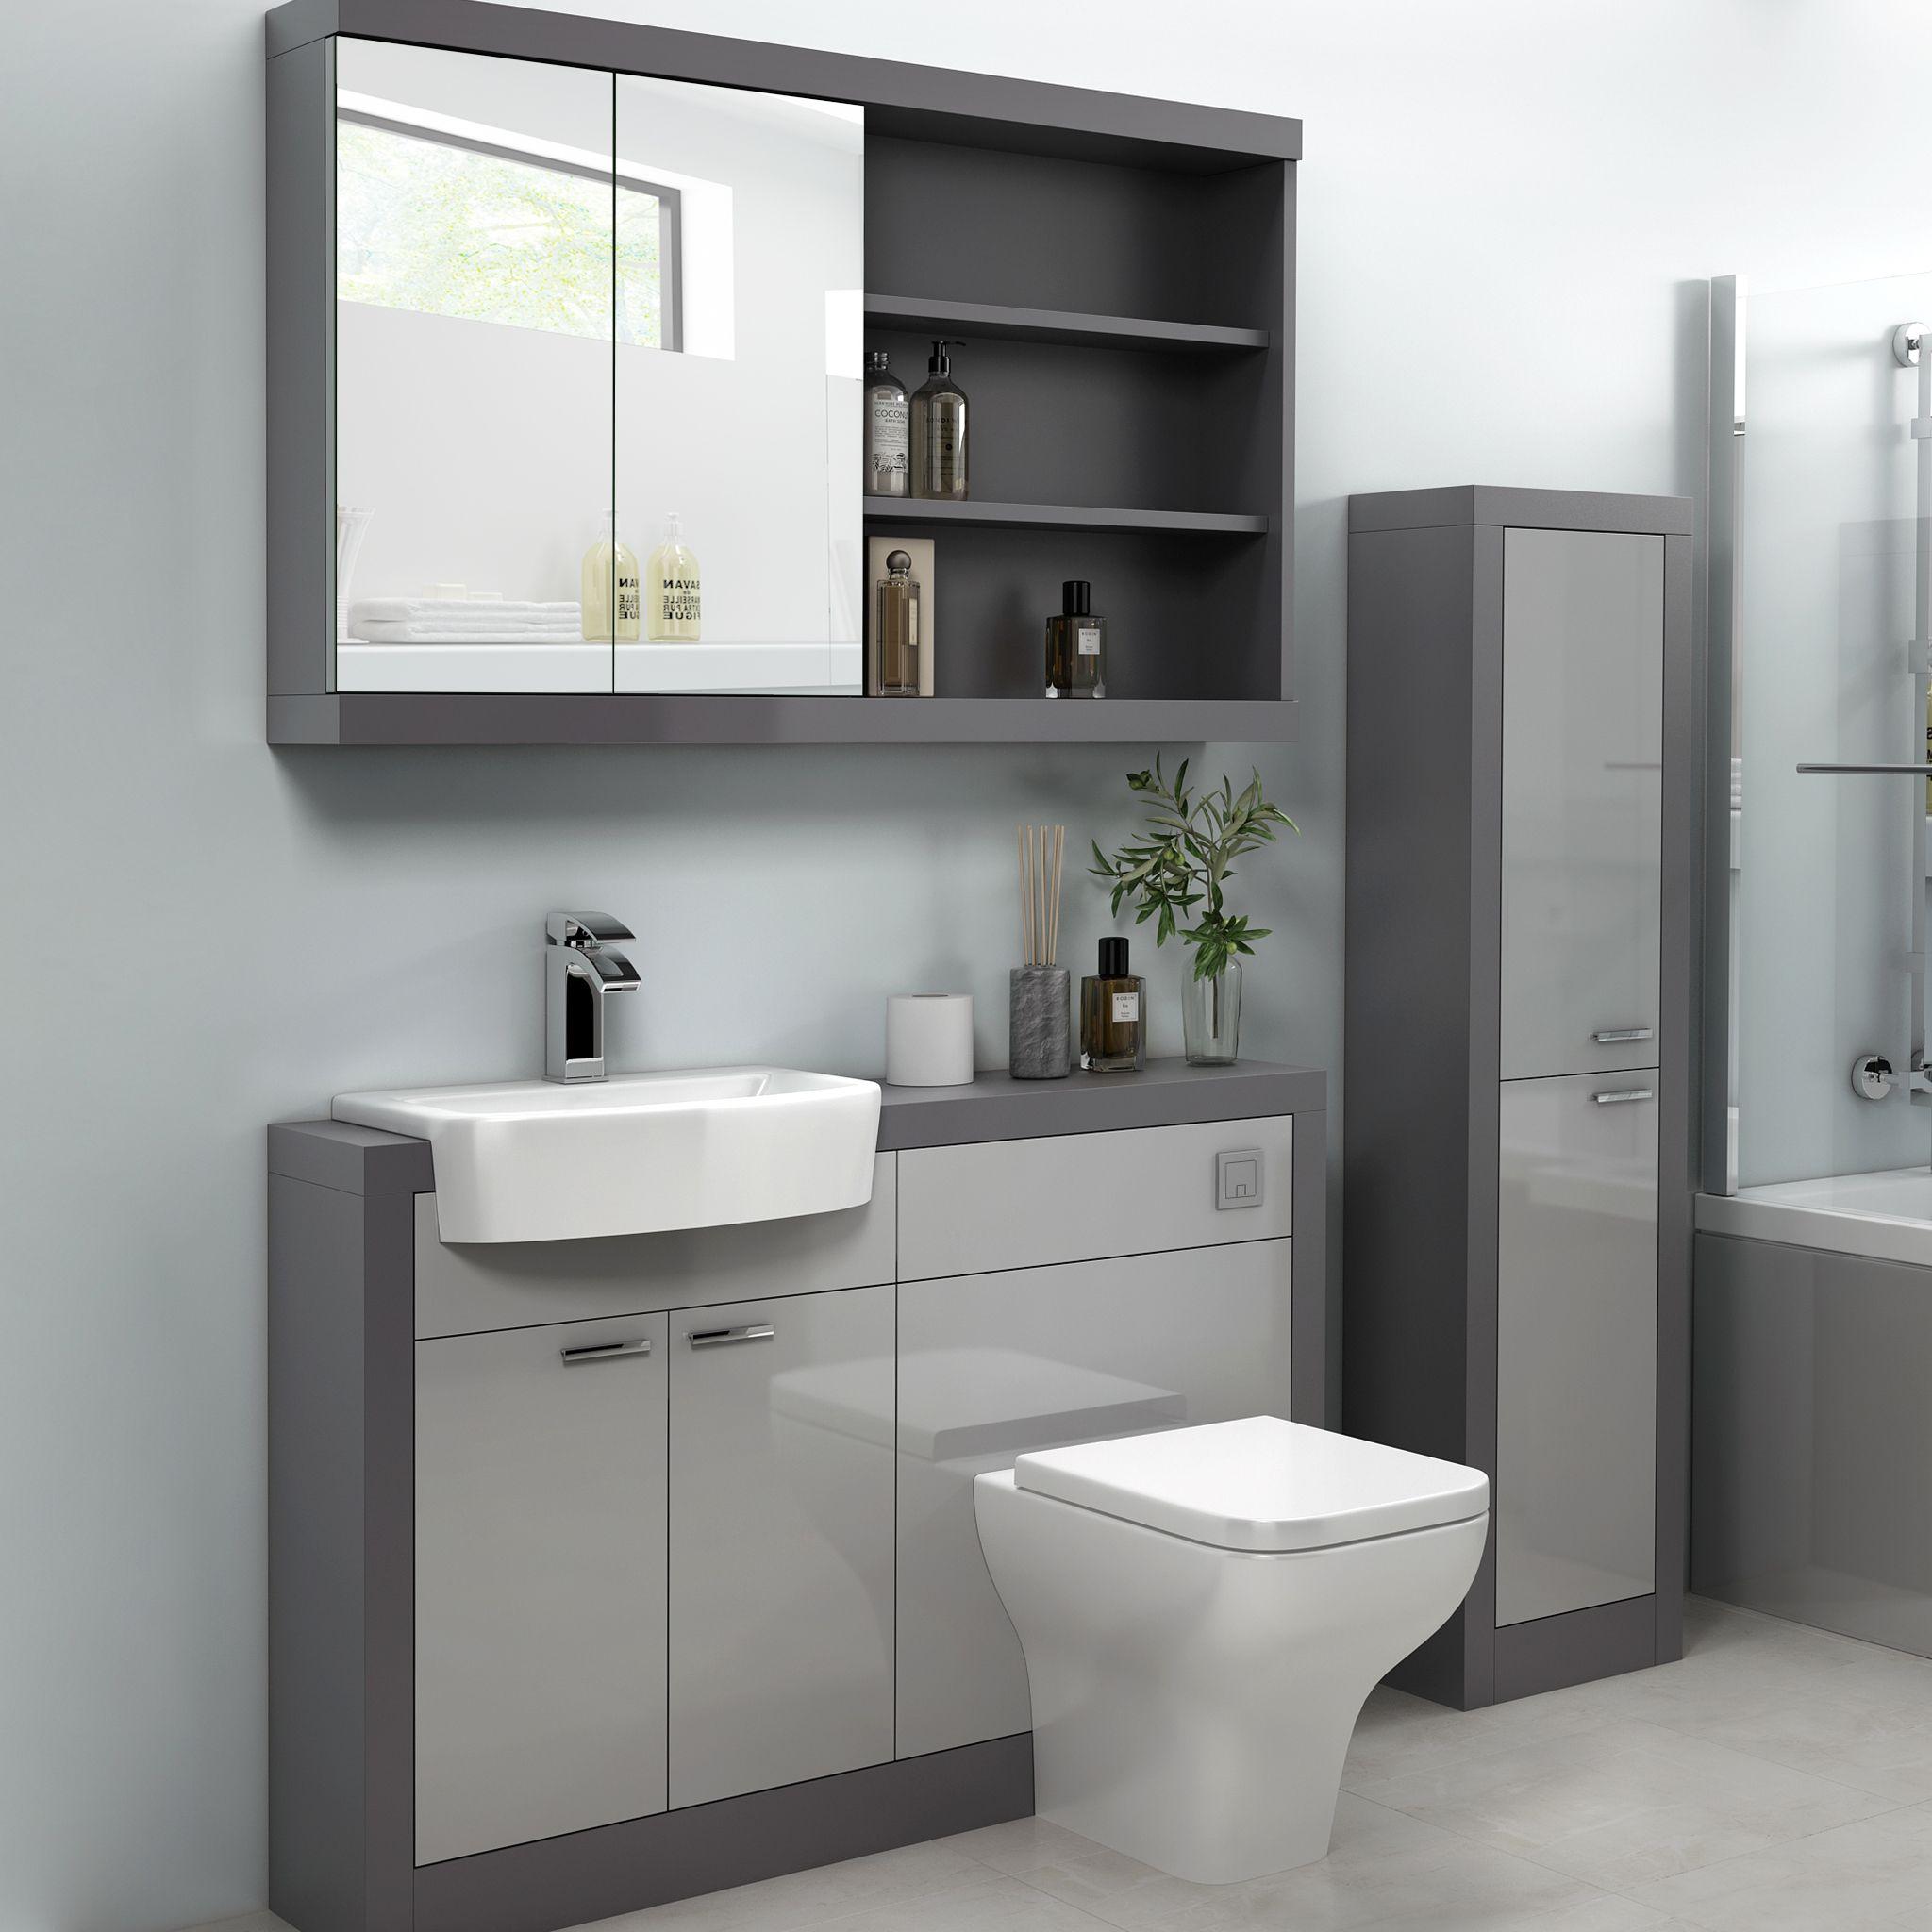 Grove 1200 Grey Vanity Unit Combination Vanity Units Vanity Units Back To Wall Toilets